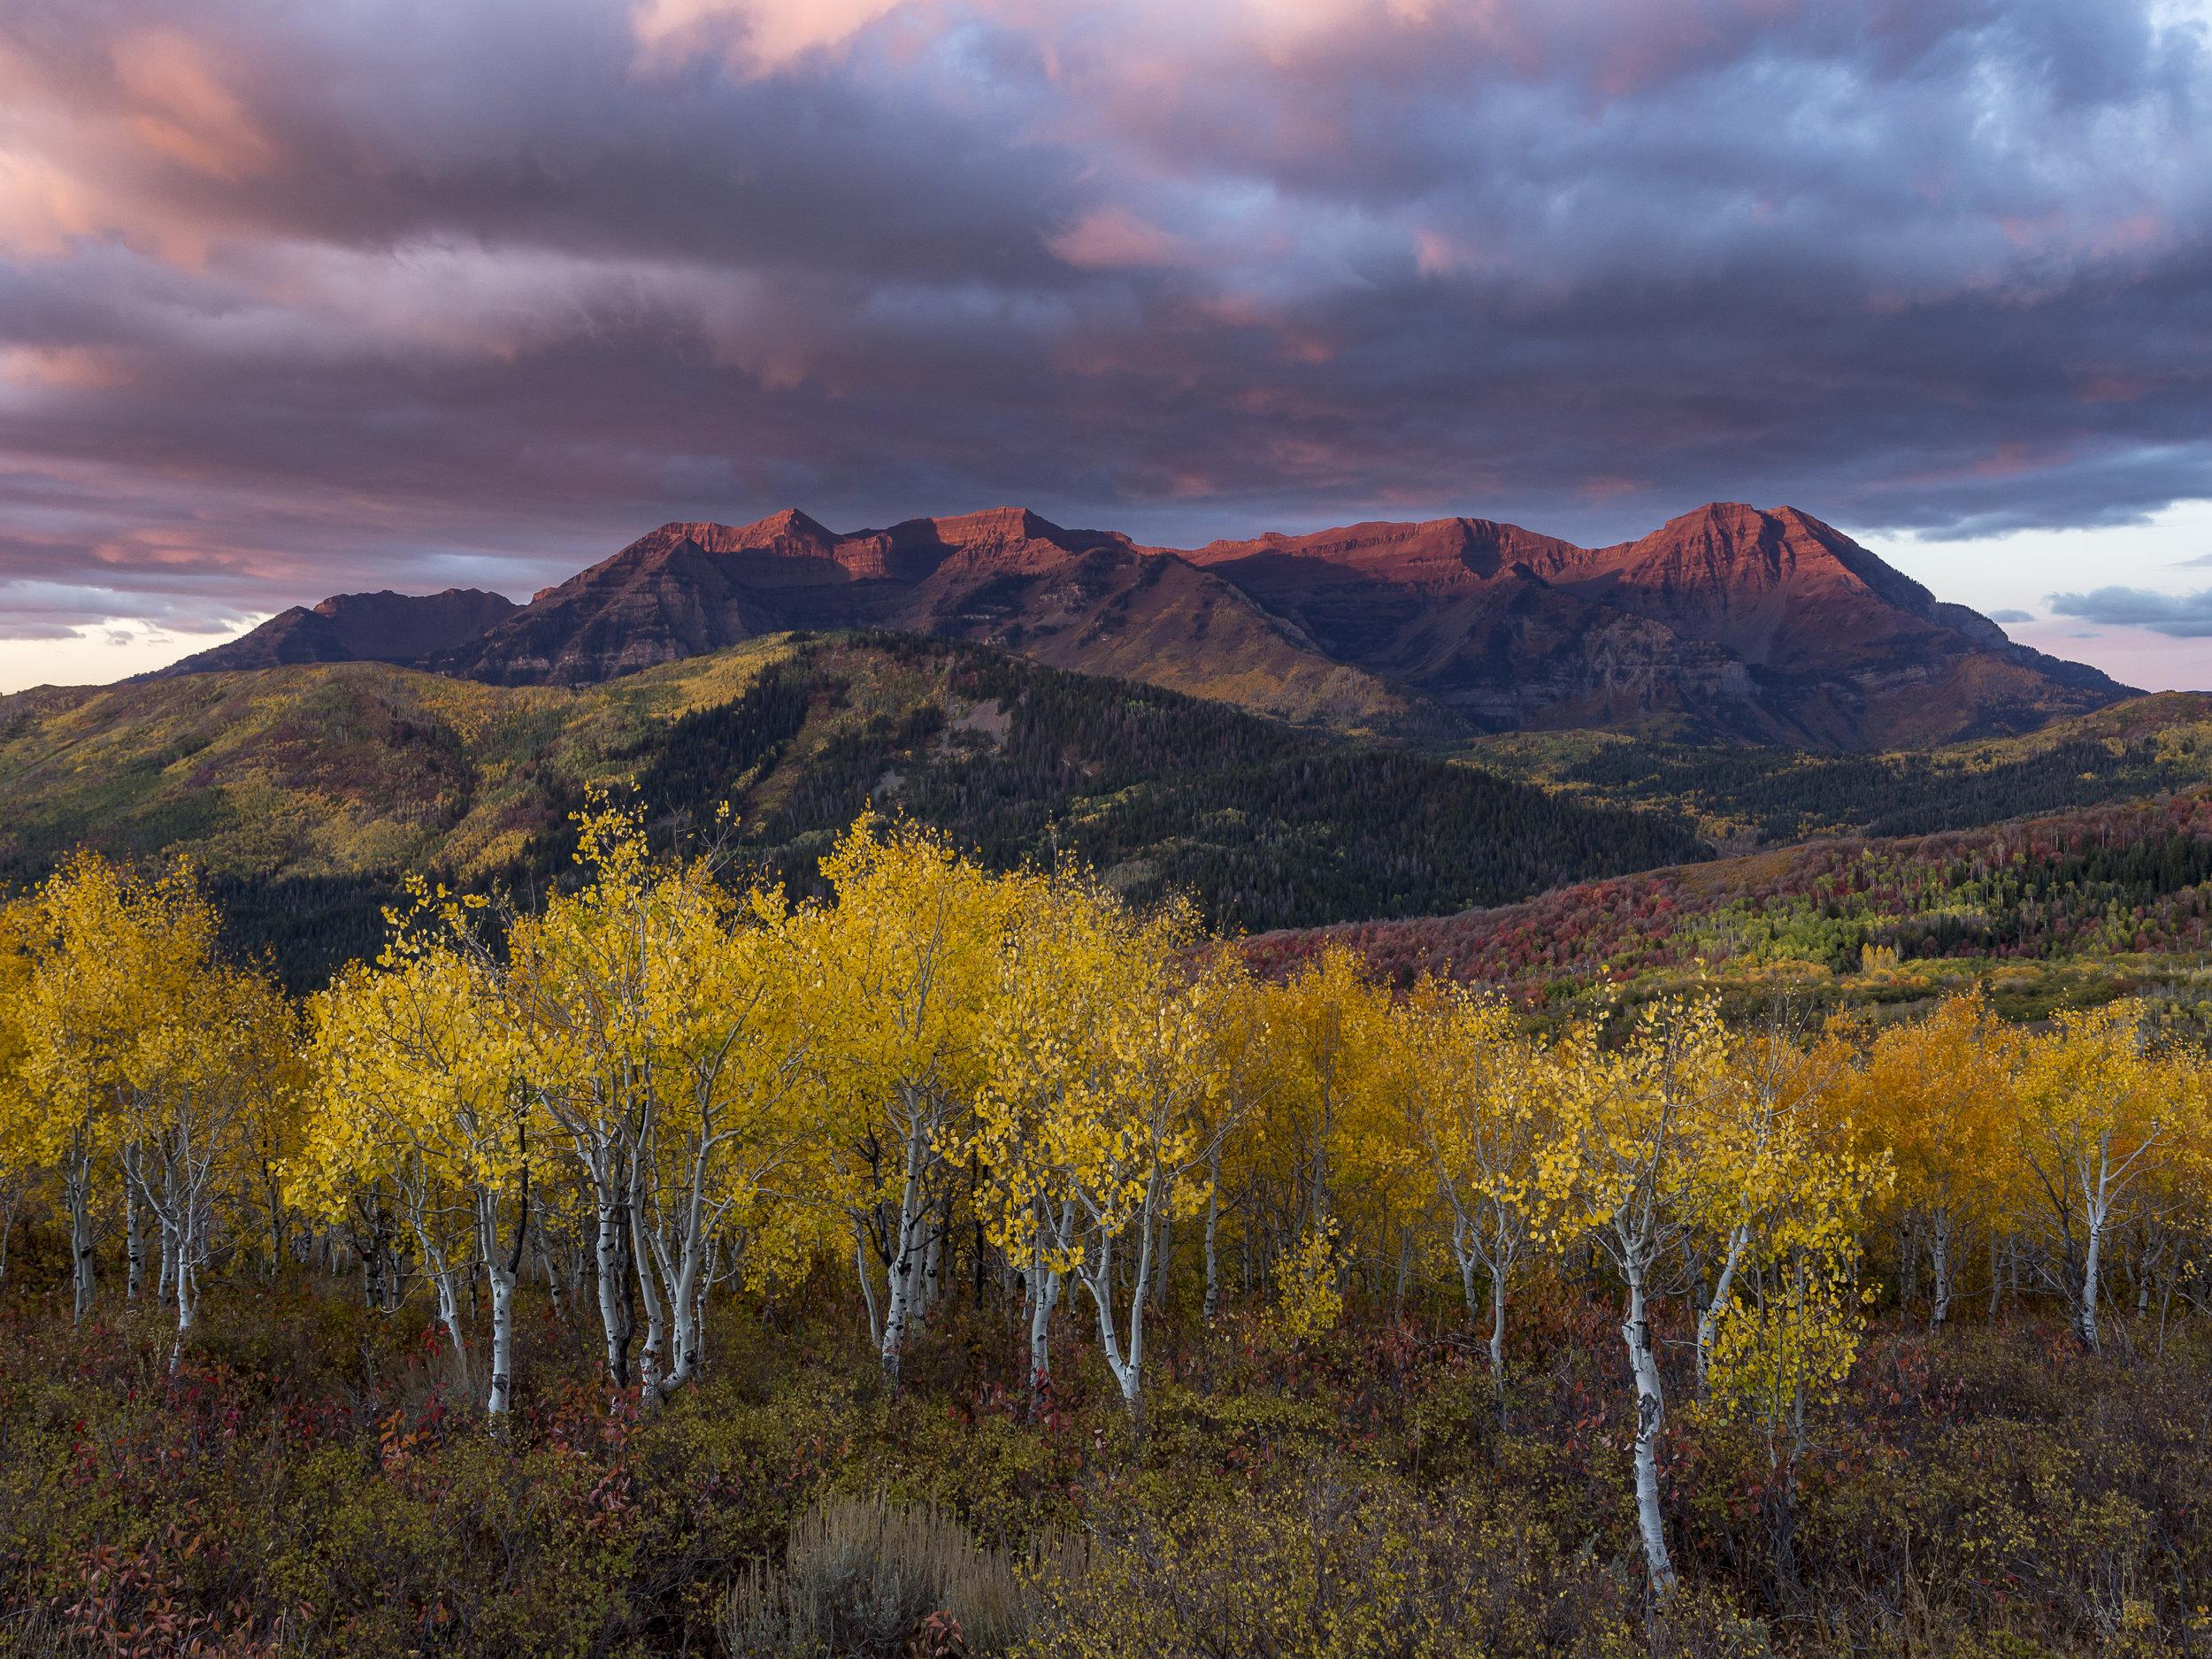 Fall Foliage at sunrise with Mount Timpanogos alpenglow